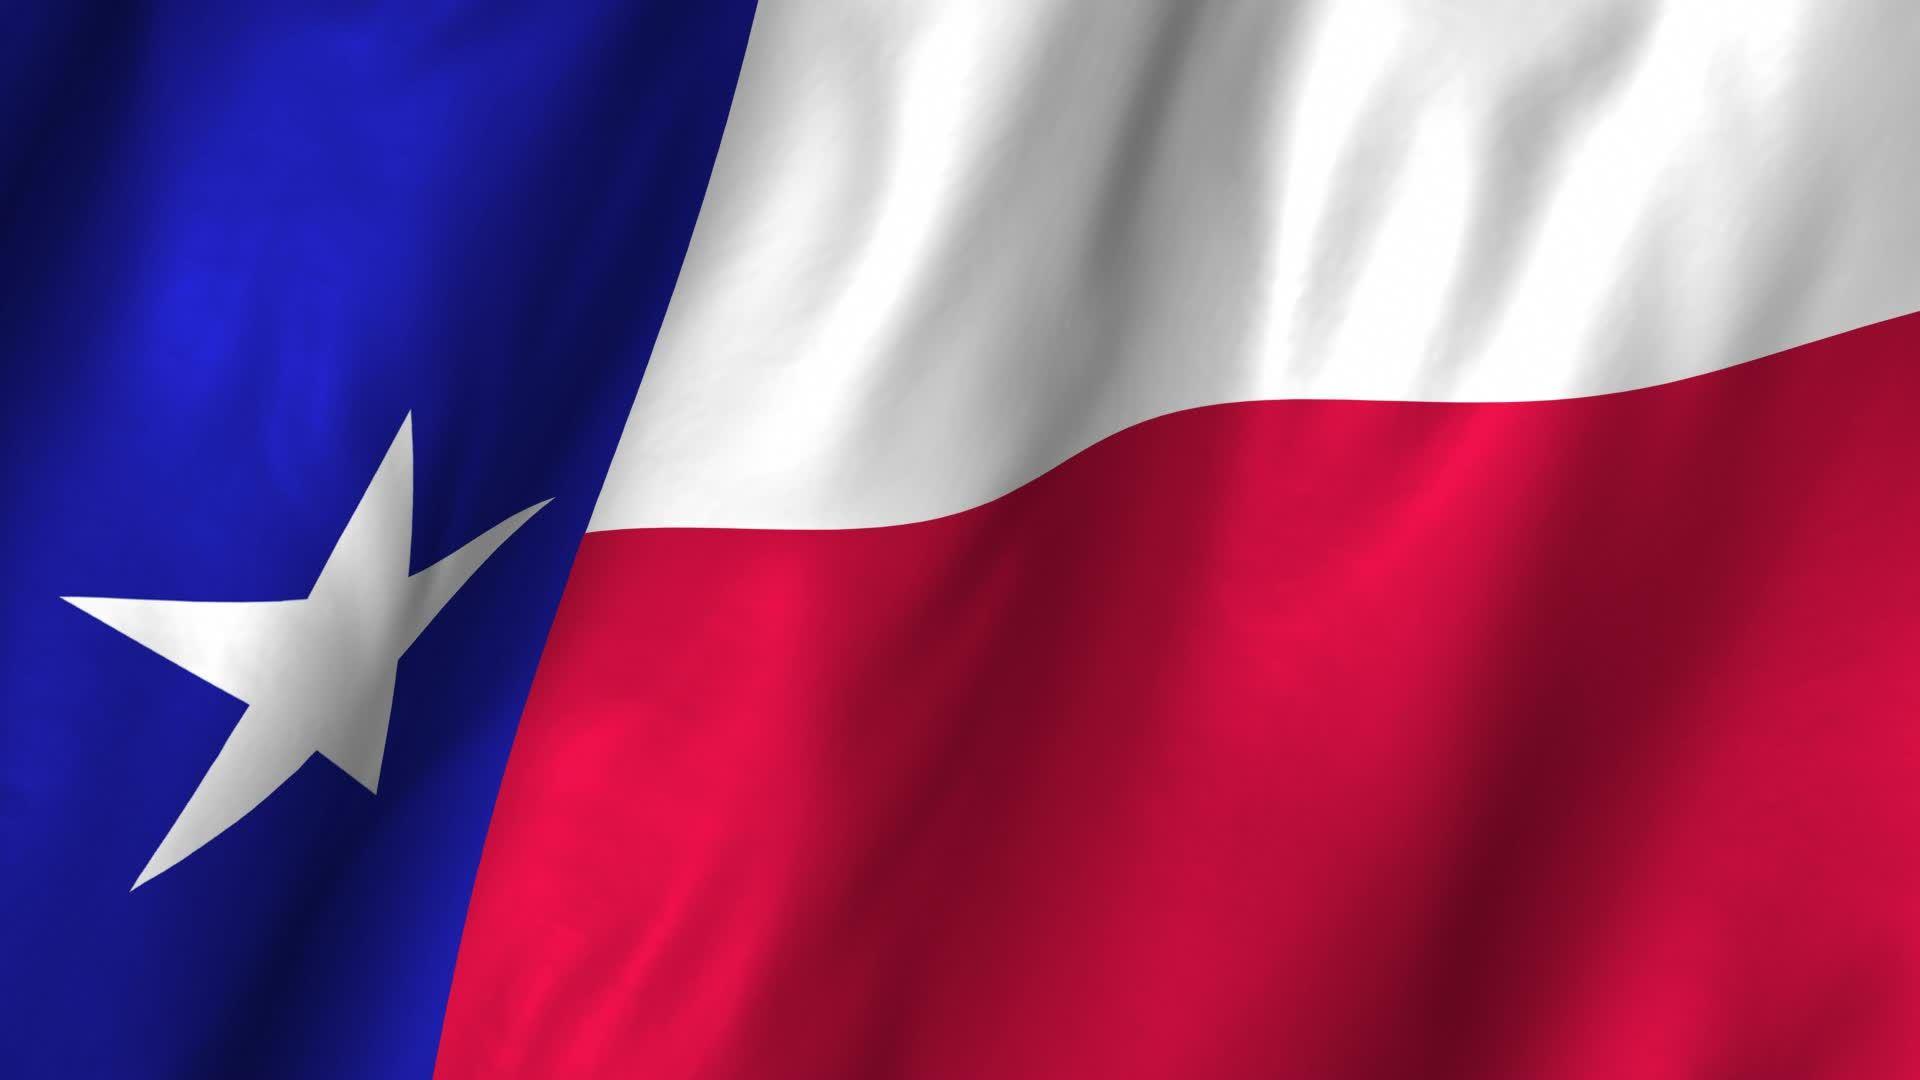 Texas Flag Waving Wallpaper